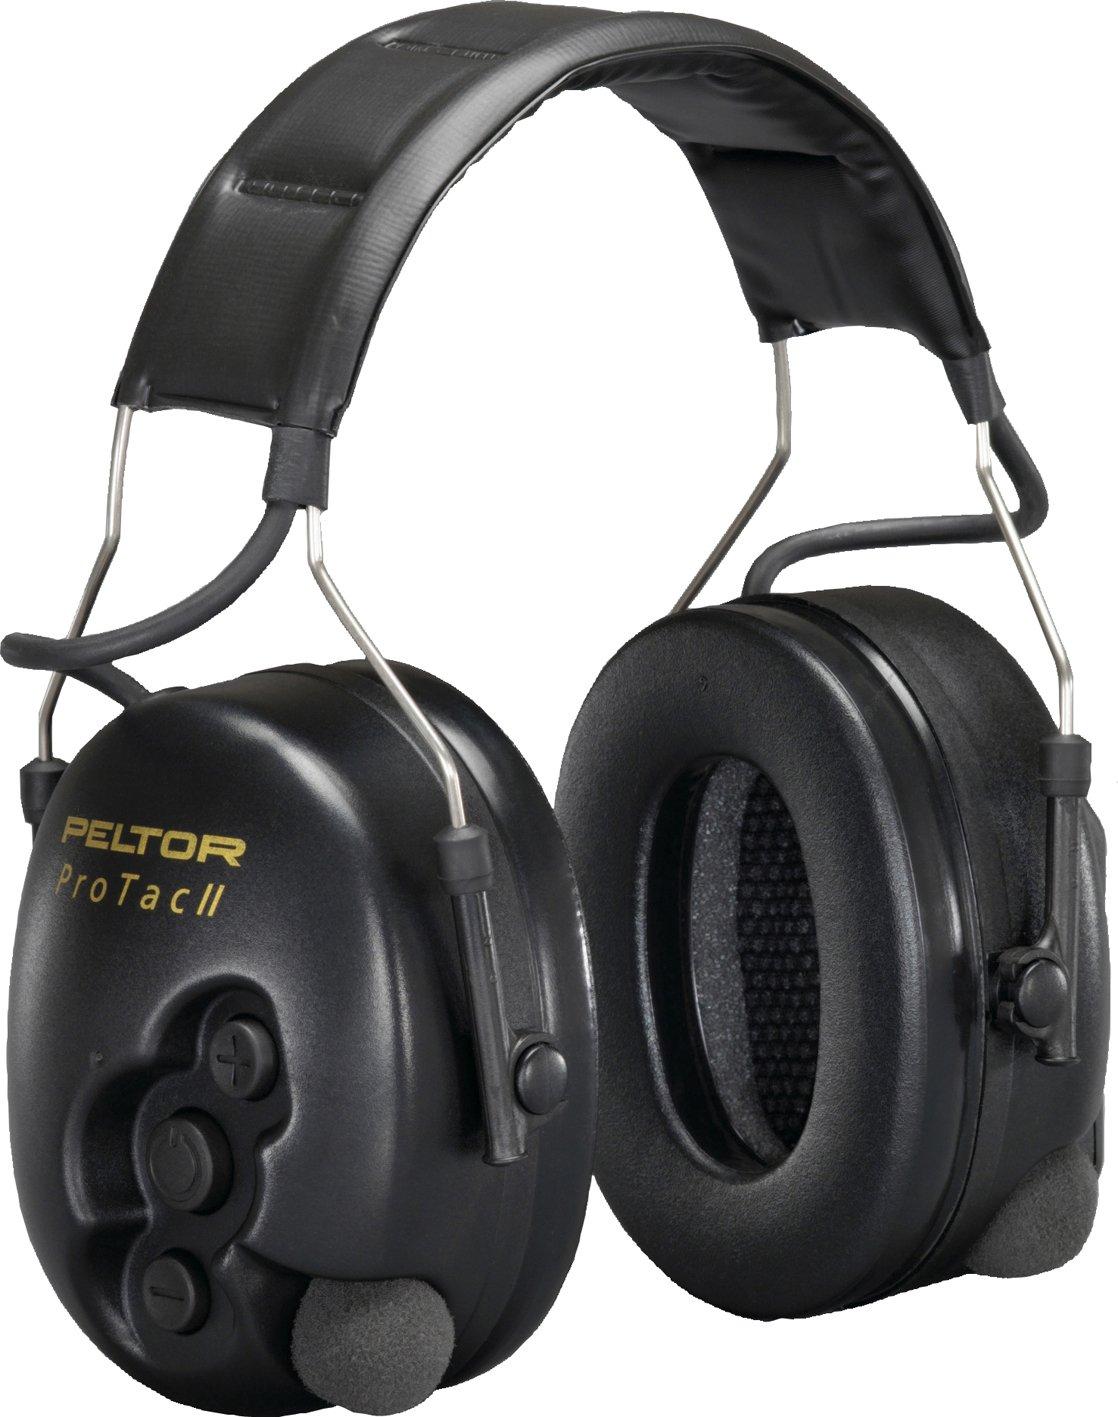 3M PELTOR ProTac II Ear Defender Headband Level Dependant 32 db Black MT15H7A2 SV